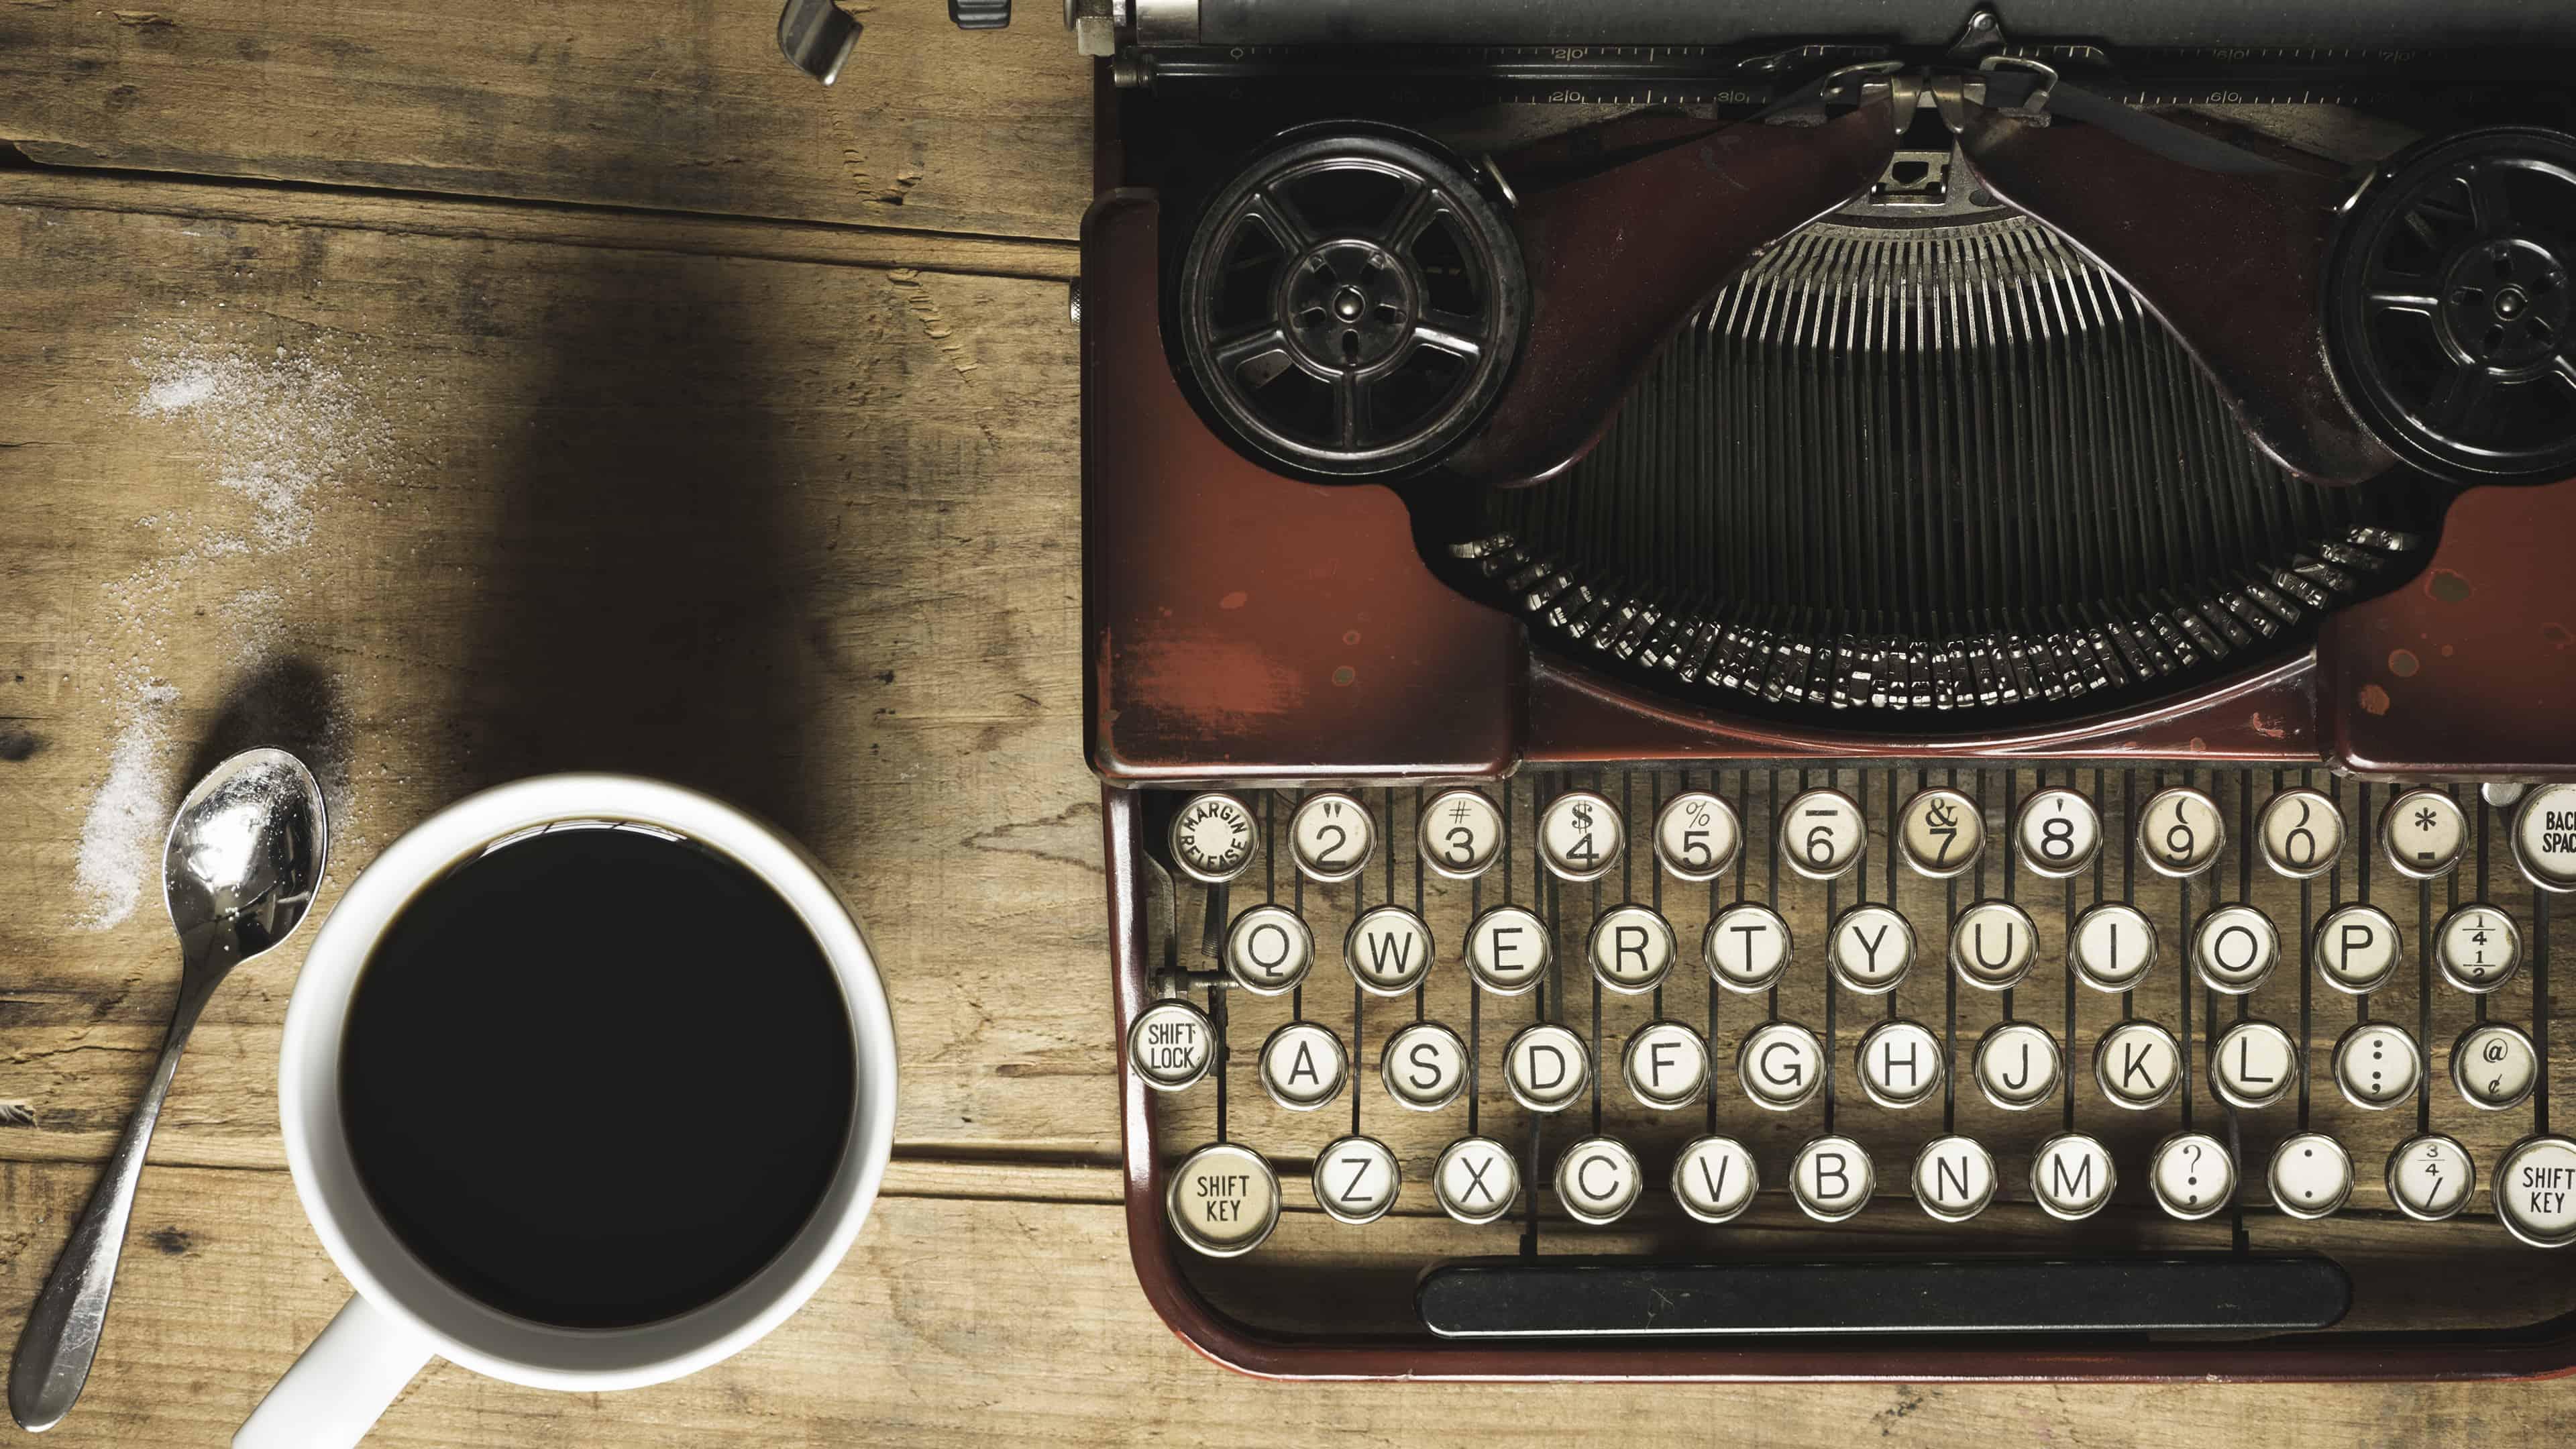 typewriter and coffee uhd 4k wallpaper